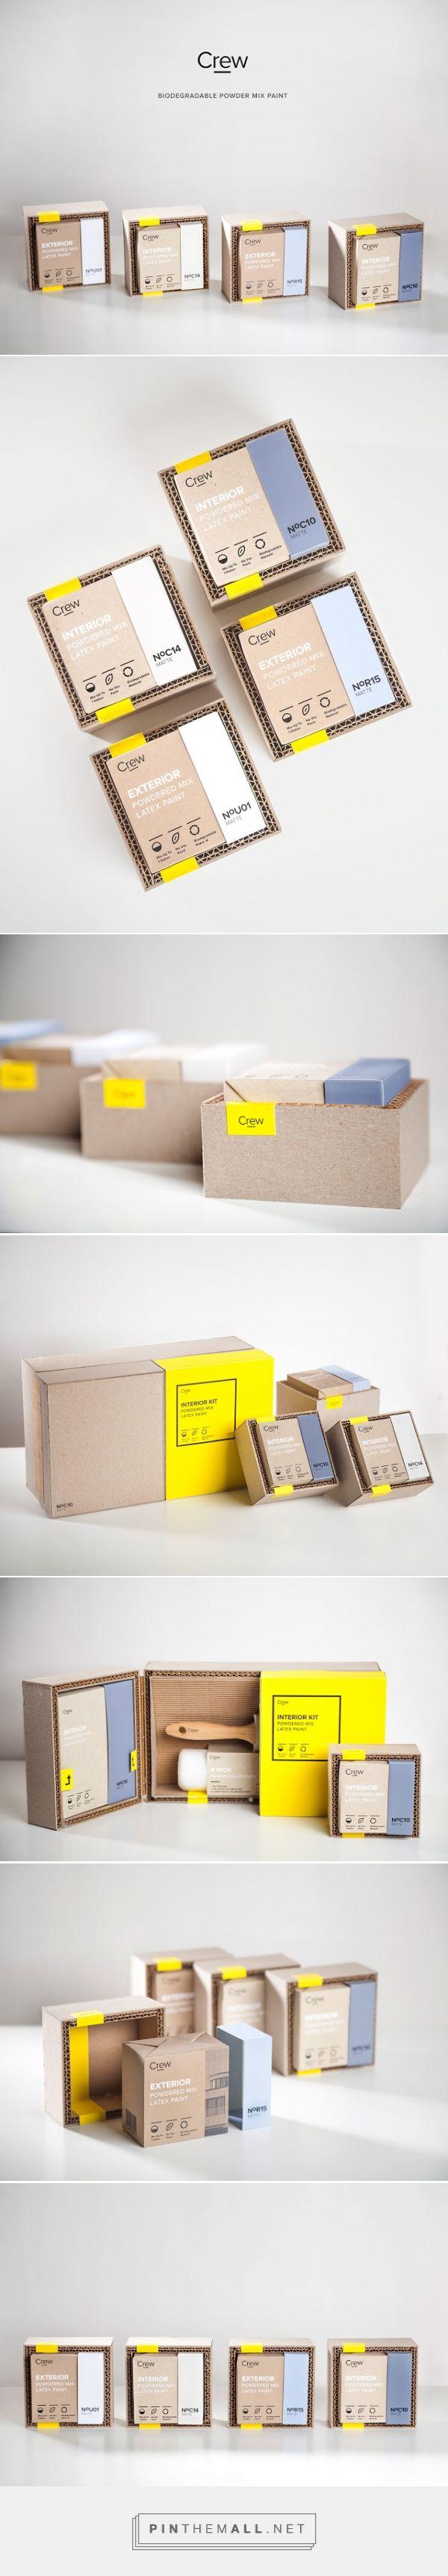 Crew Paint Kit Packaging designed by Alireza Jajarmi - http://www.packagingoftheworld.com/2015/12/crew-paint-kit.html